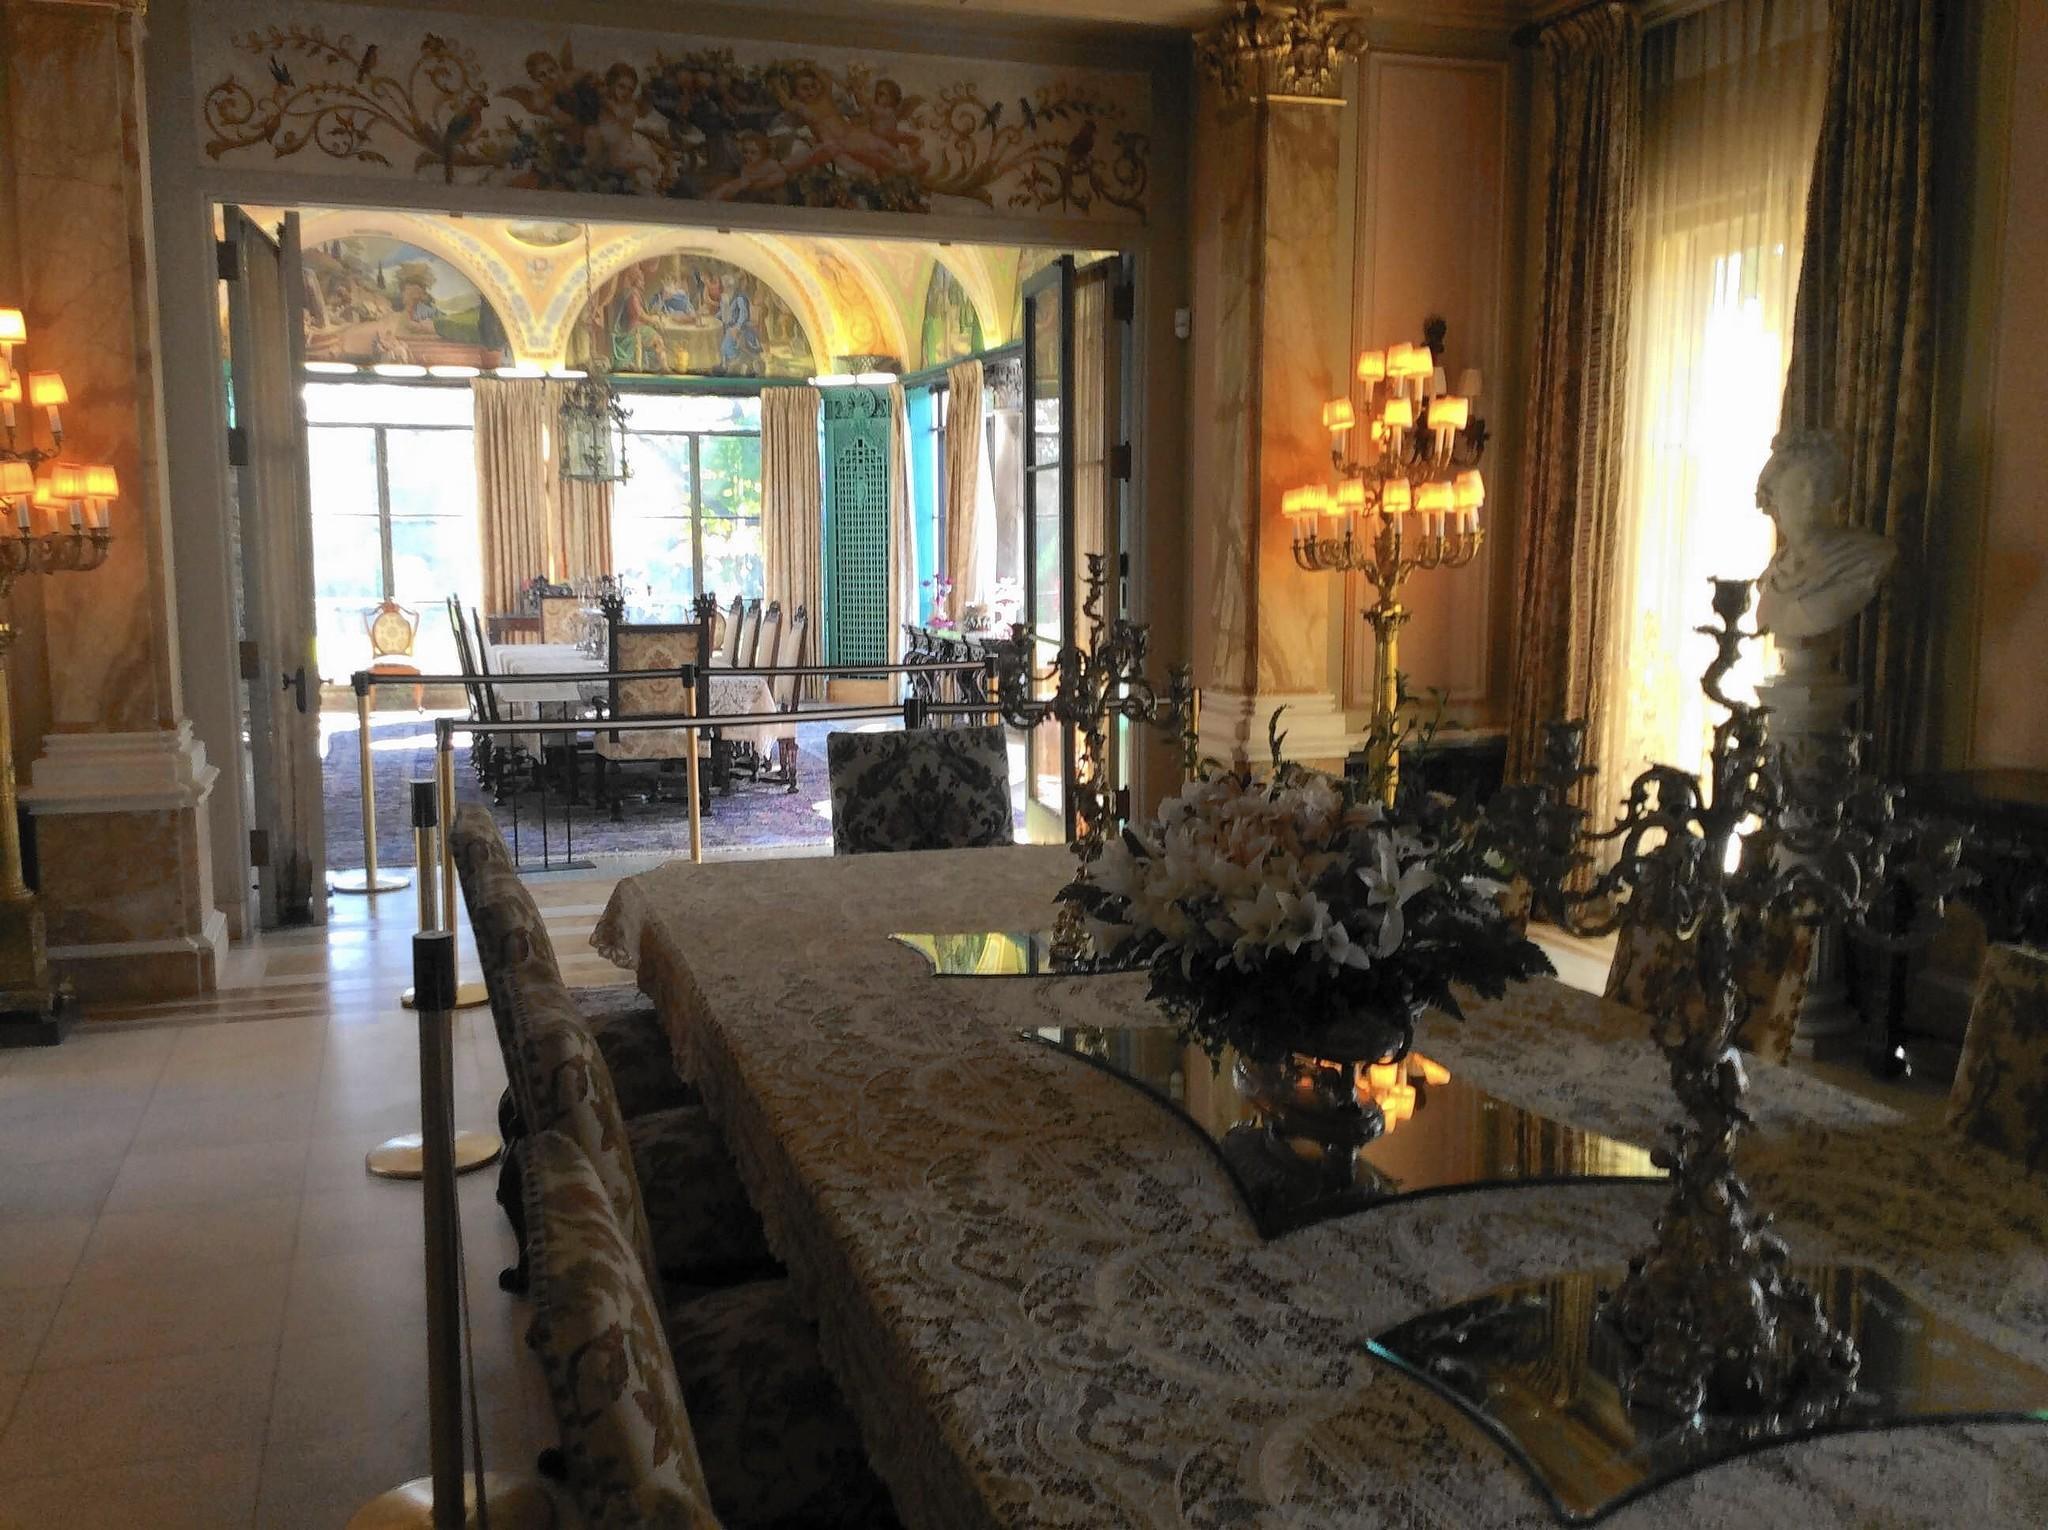 [Image: ct-lns-cuneo-mansion-restoration-st-1024-20161023]